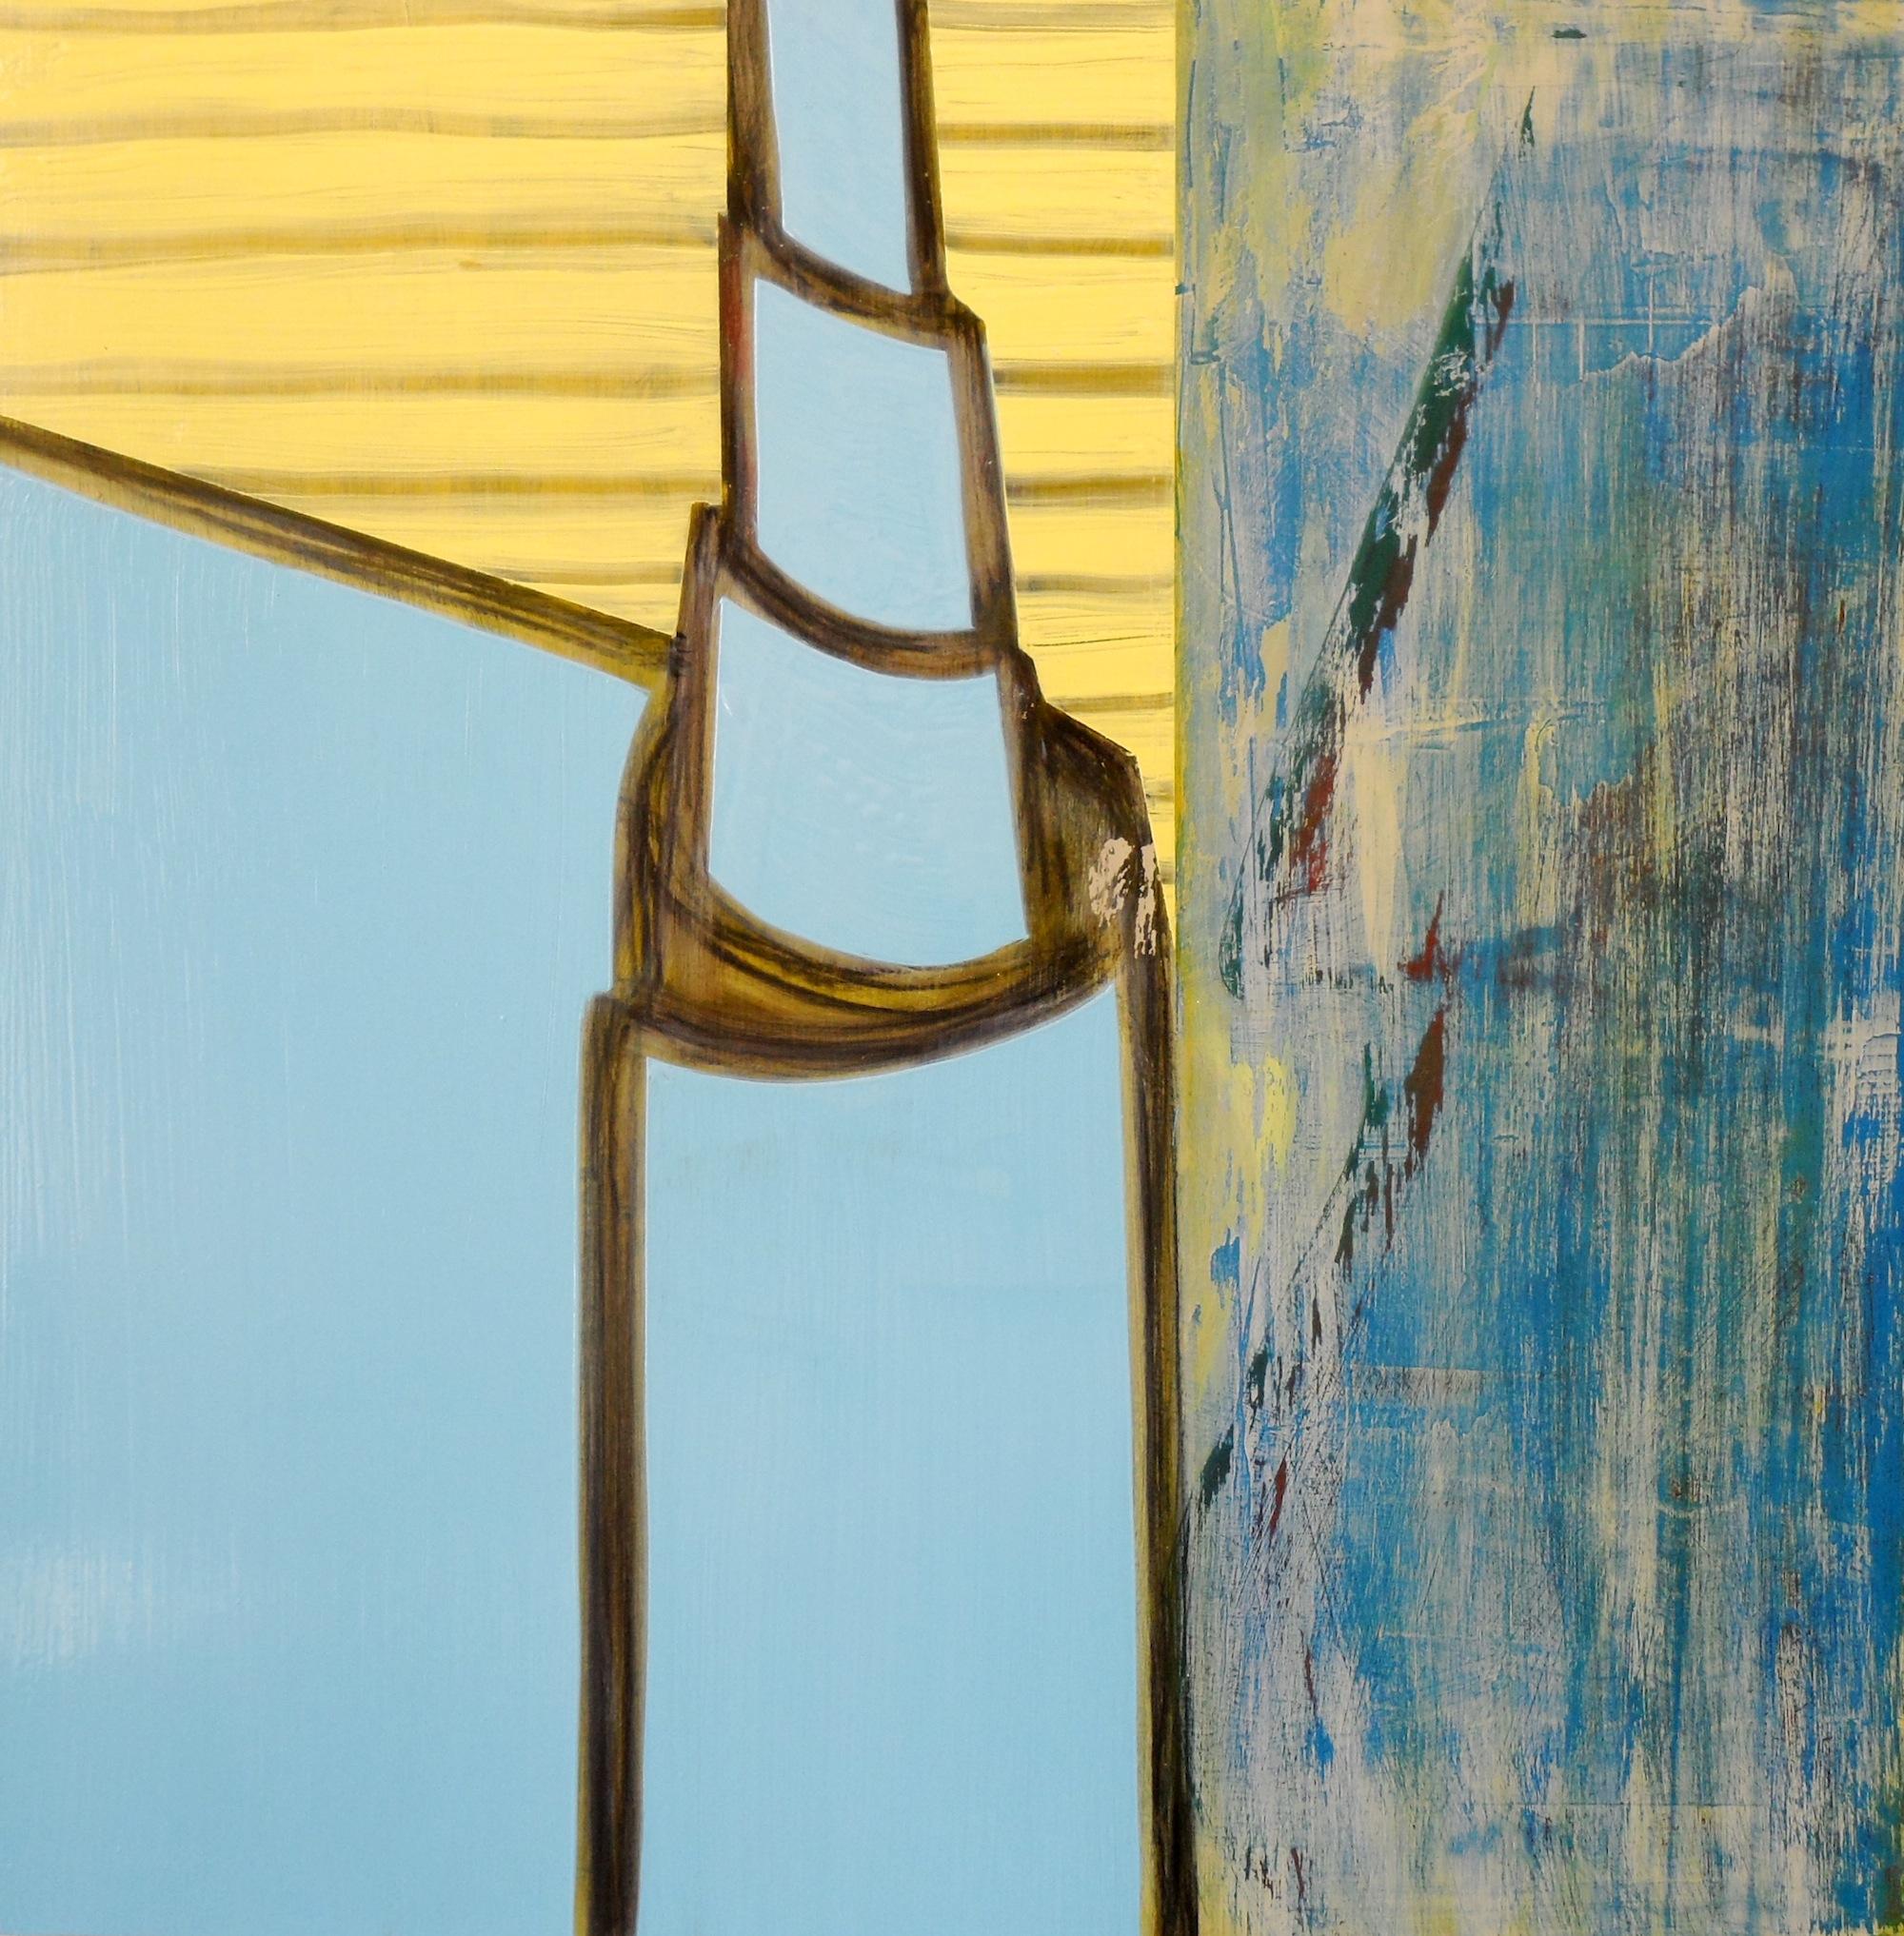 Objet d'Art 3, Acrylic and oil on board